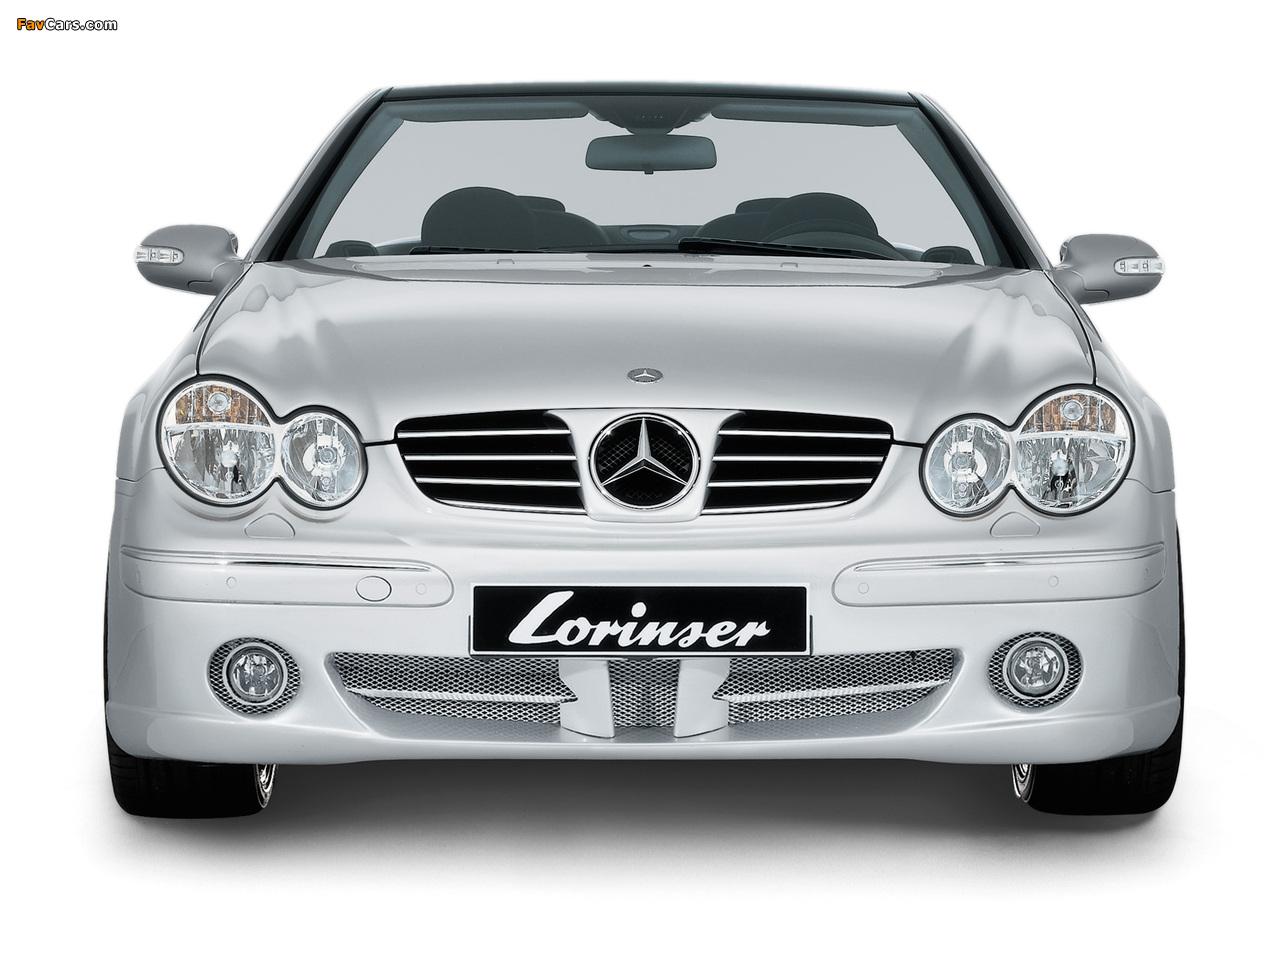 Pictures of Lorinser Mercedes-Benz CLK-Klasse (A209) (1280 x 960)